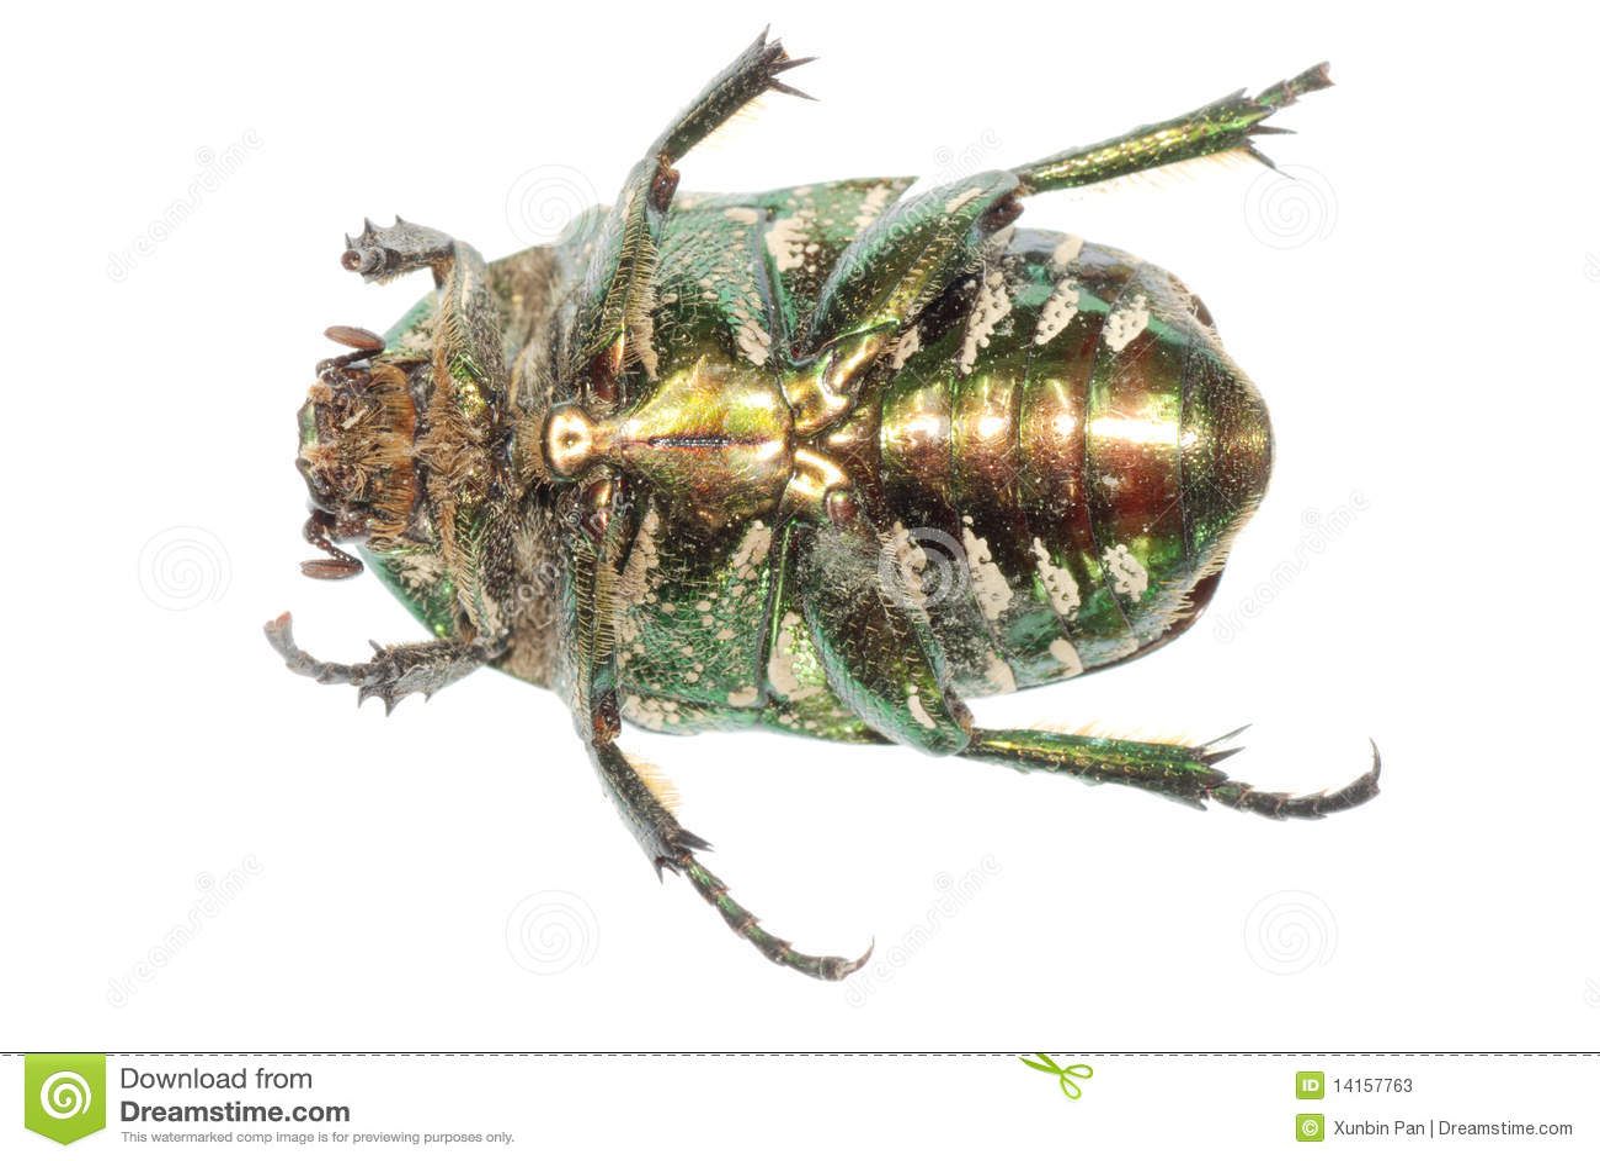 Grüner Insektkäfer